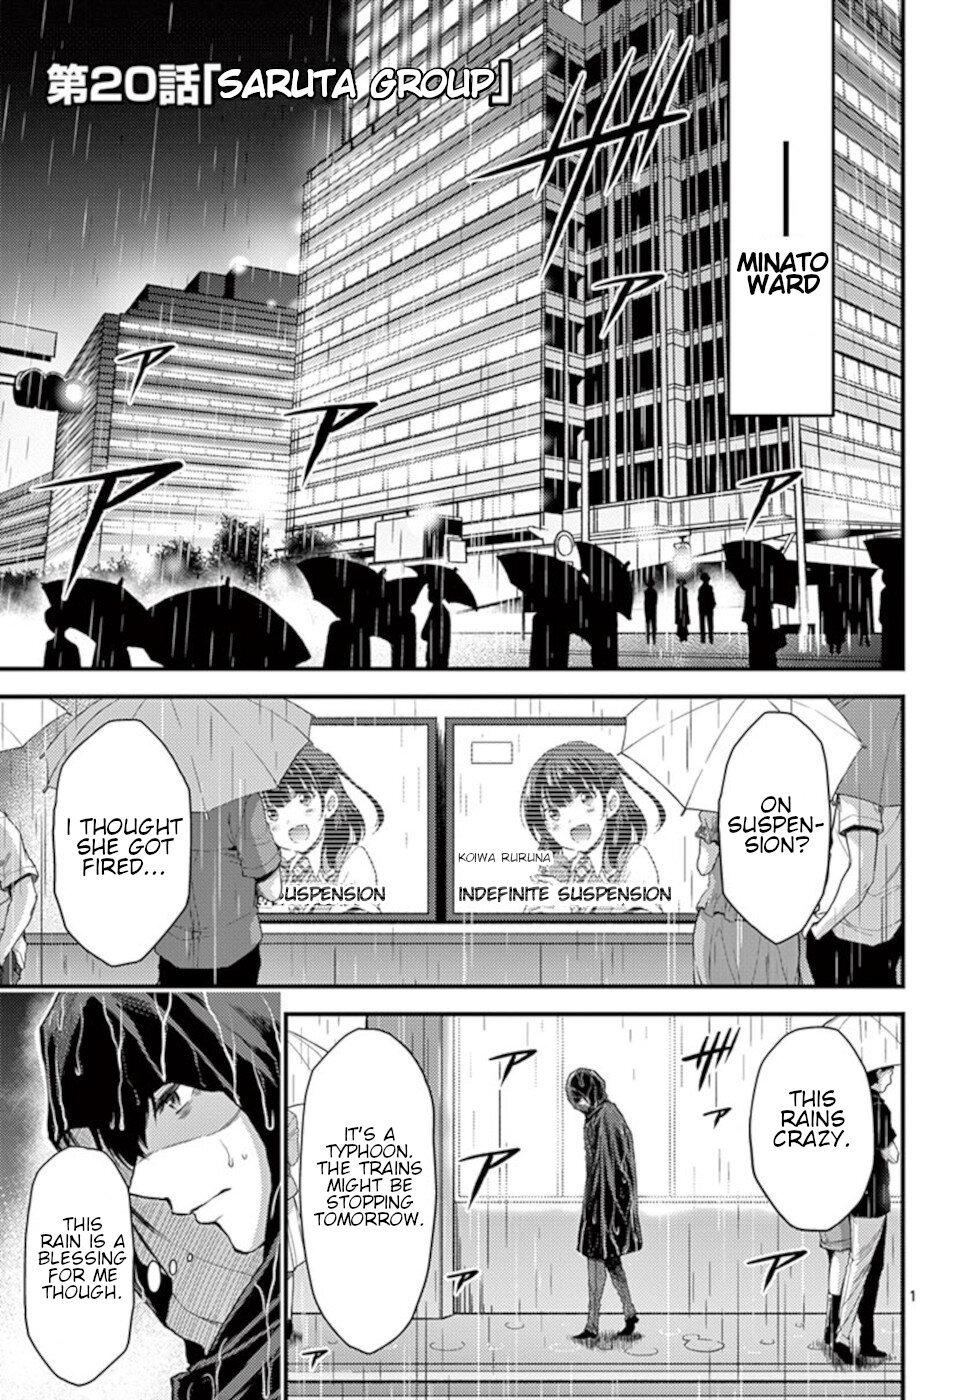 https://manga.mangadogs.com/comics/pic4/12/30348/2910580/e148986e6924746d6ffc0e0cda229eeb.jpg Page 1